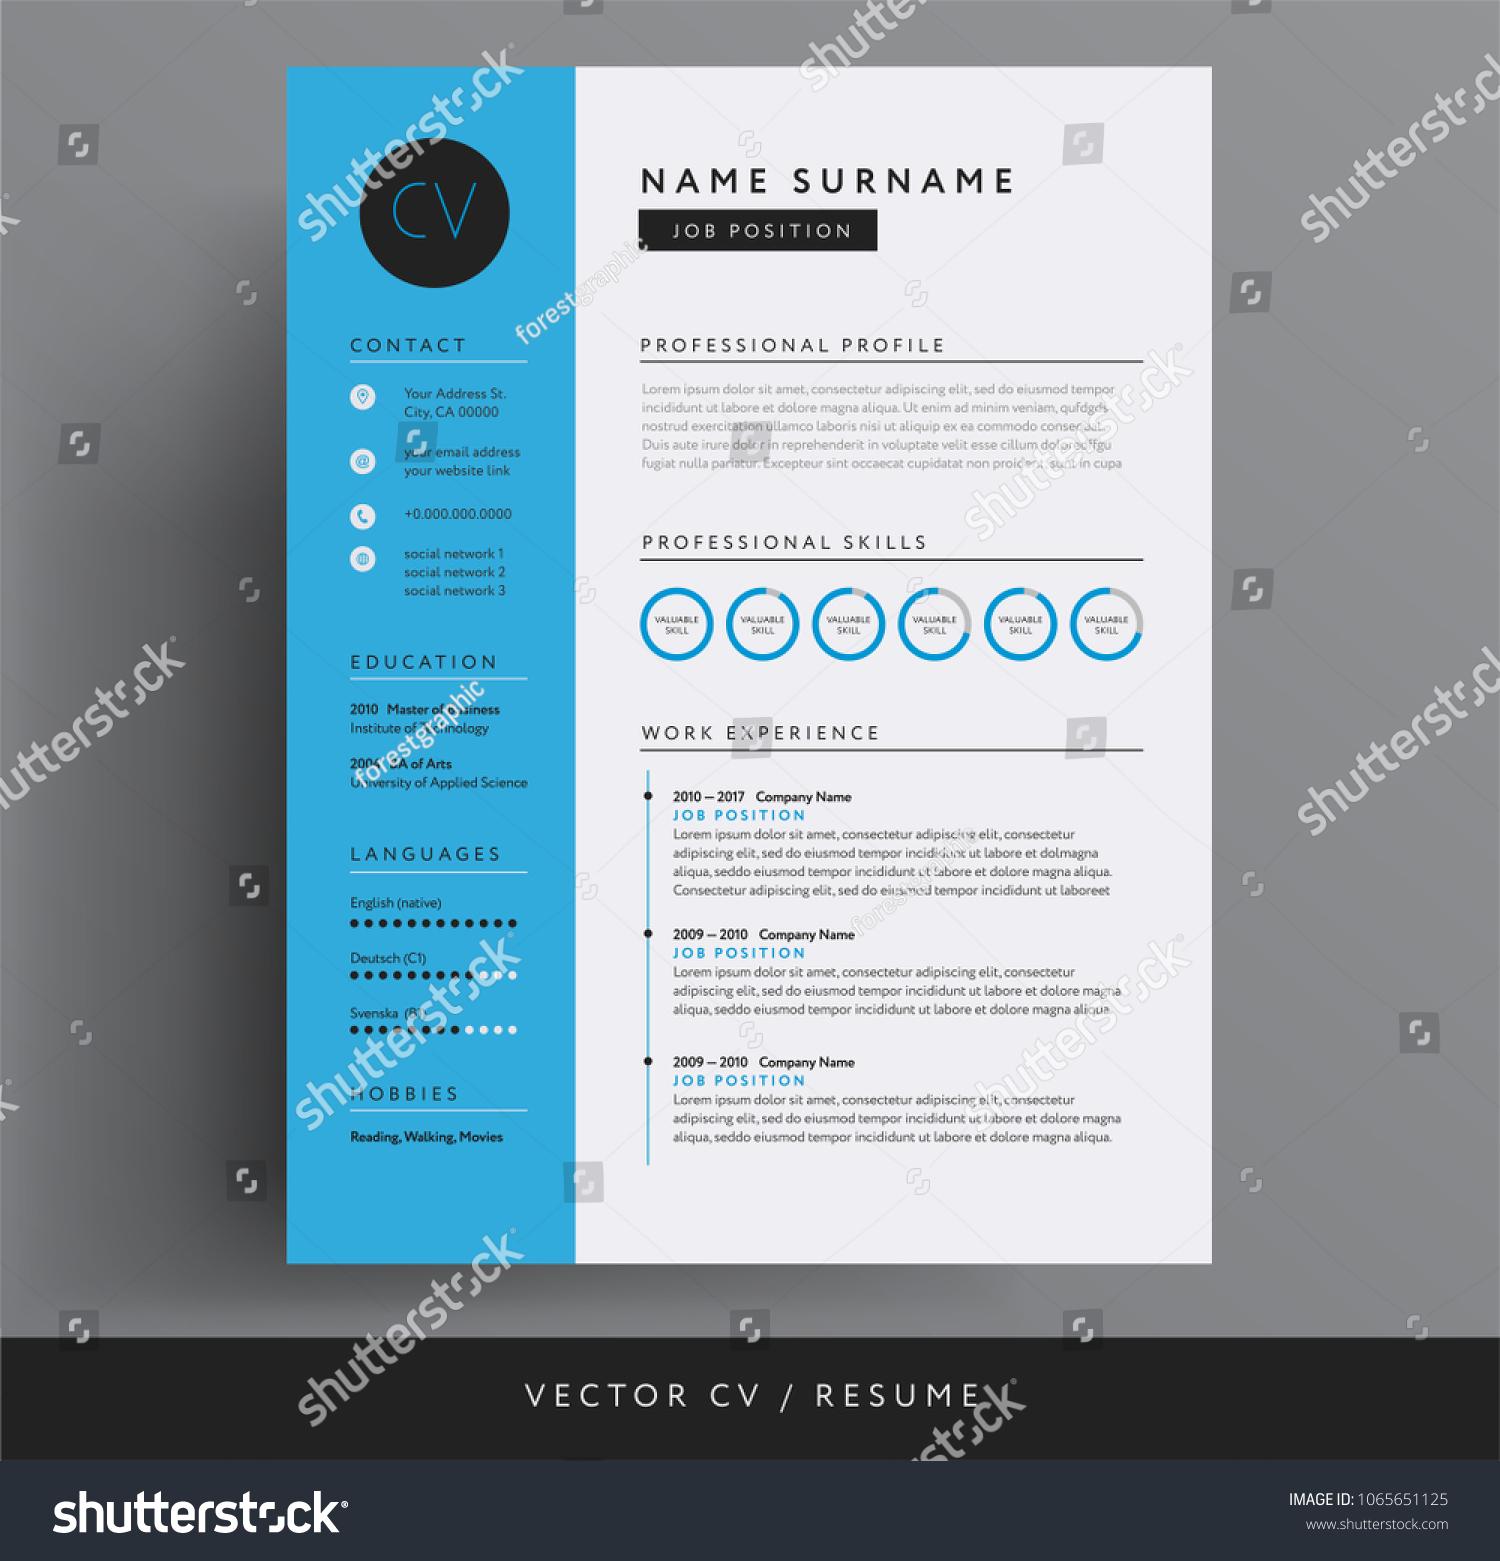 Cv Resume Design Template Blue Color Stock Vector Royalty Free